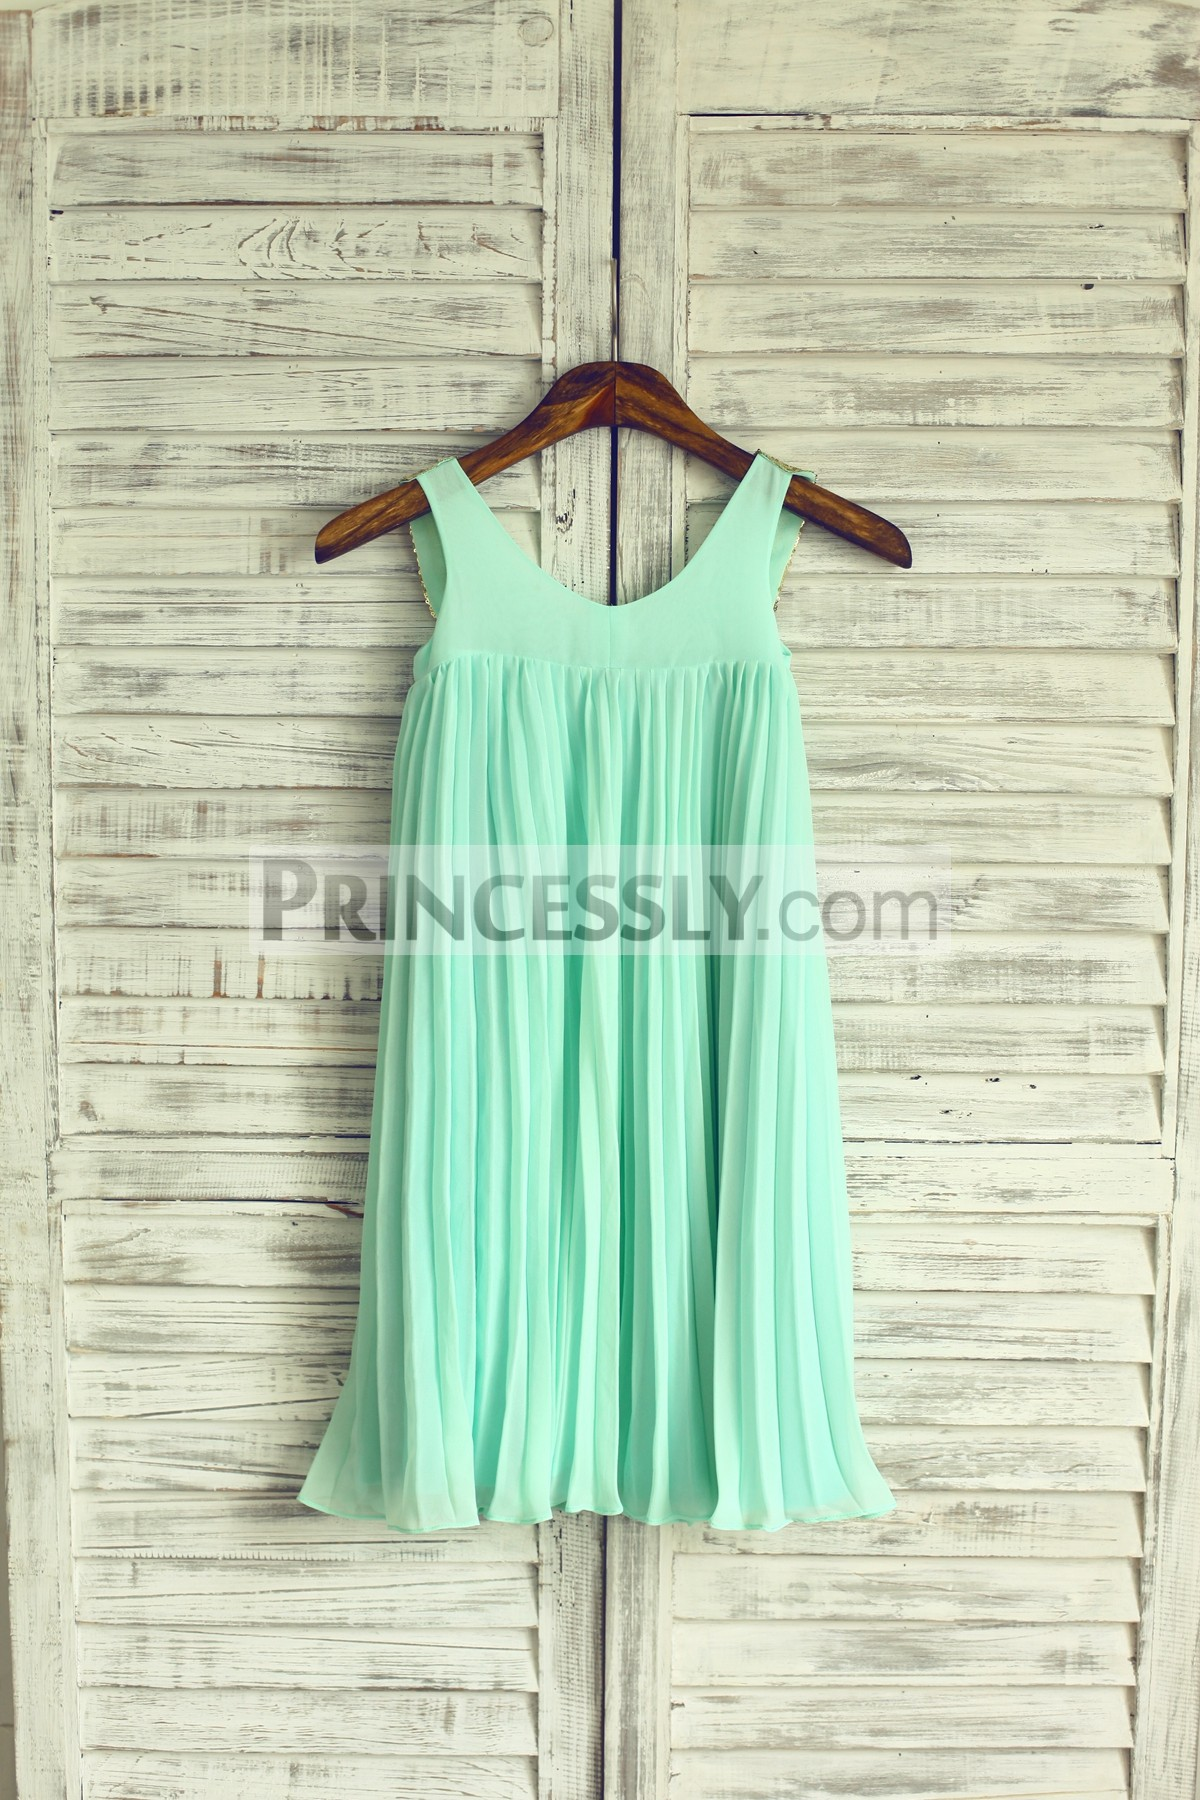 bdc3484c5f9 Mint chiffon pleated flower girl dress · Gold sequin peter pan collar ivory  chiffon flower girl dress